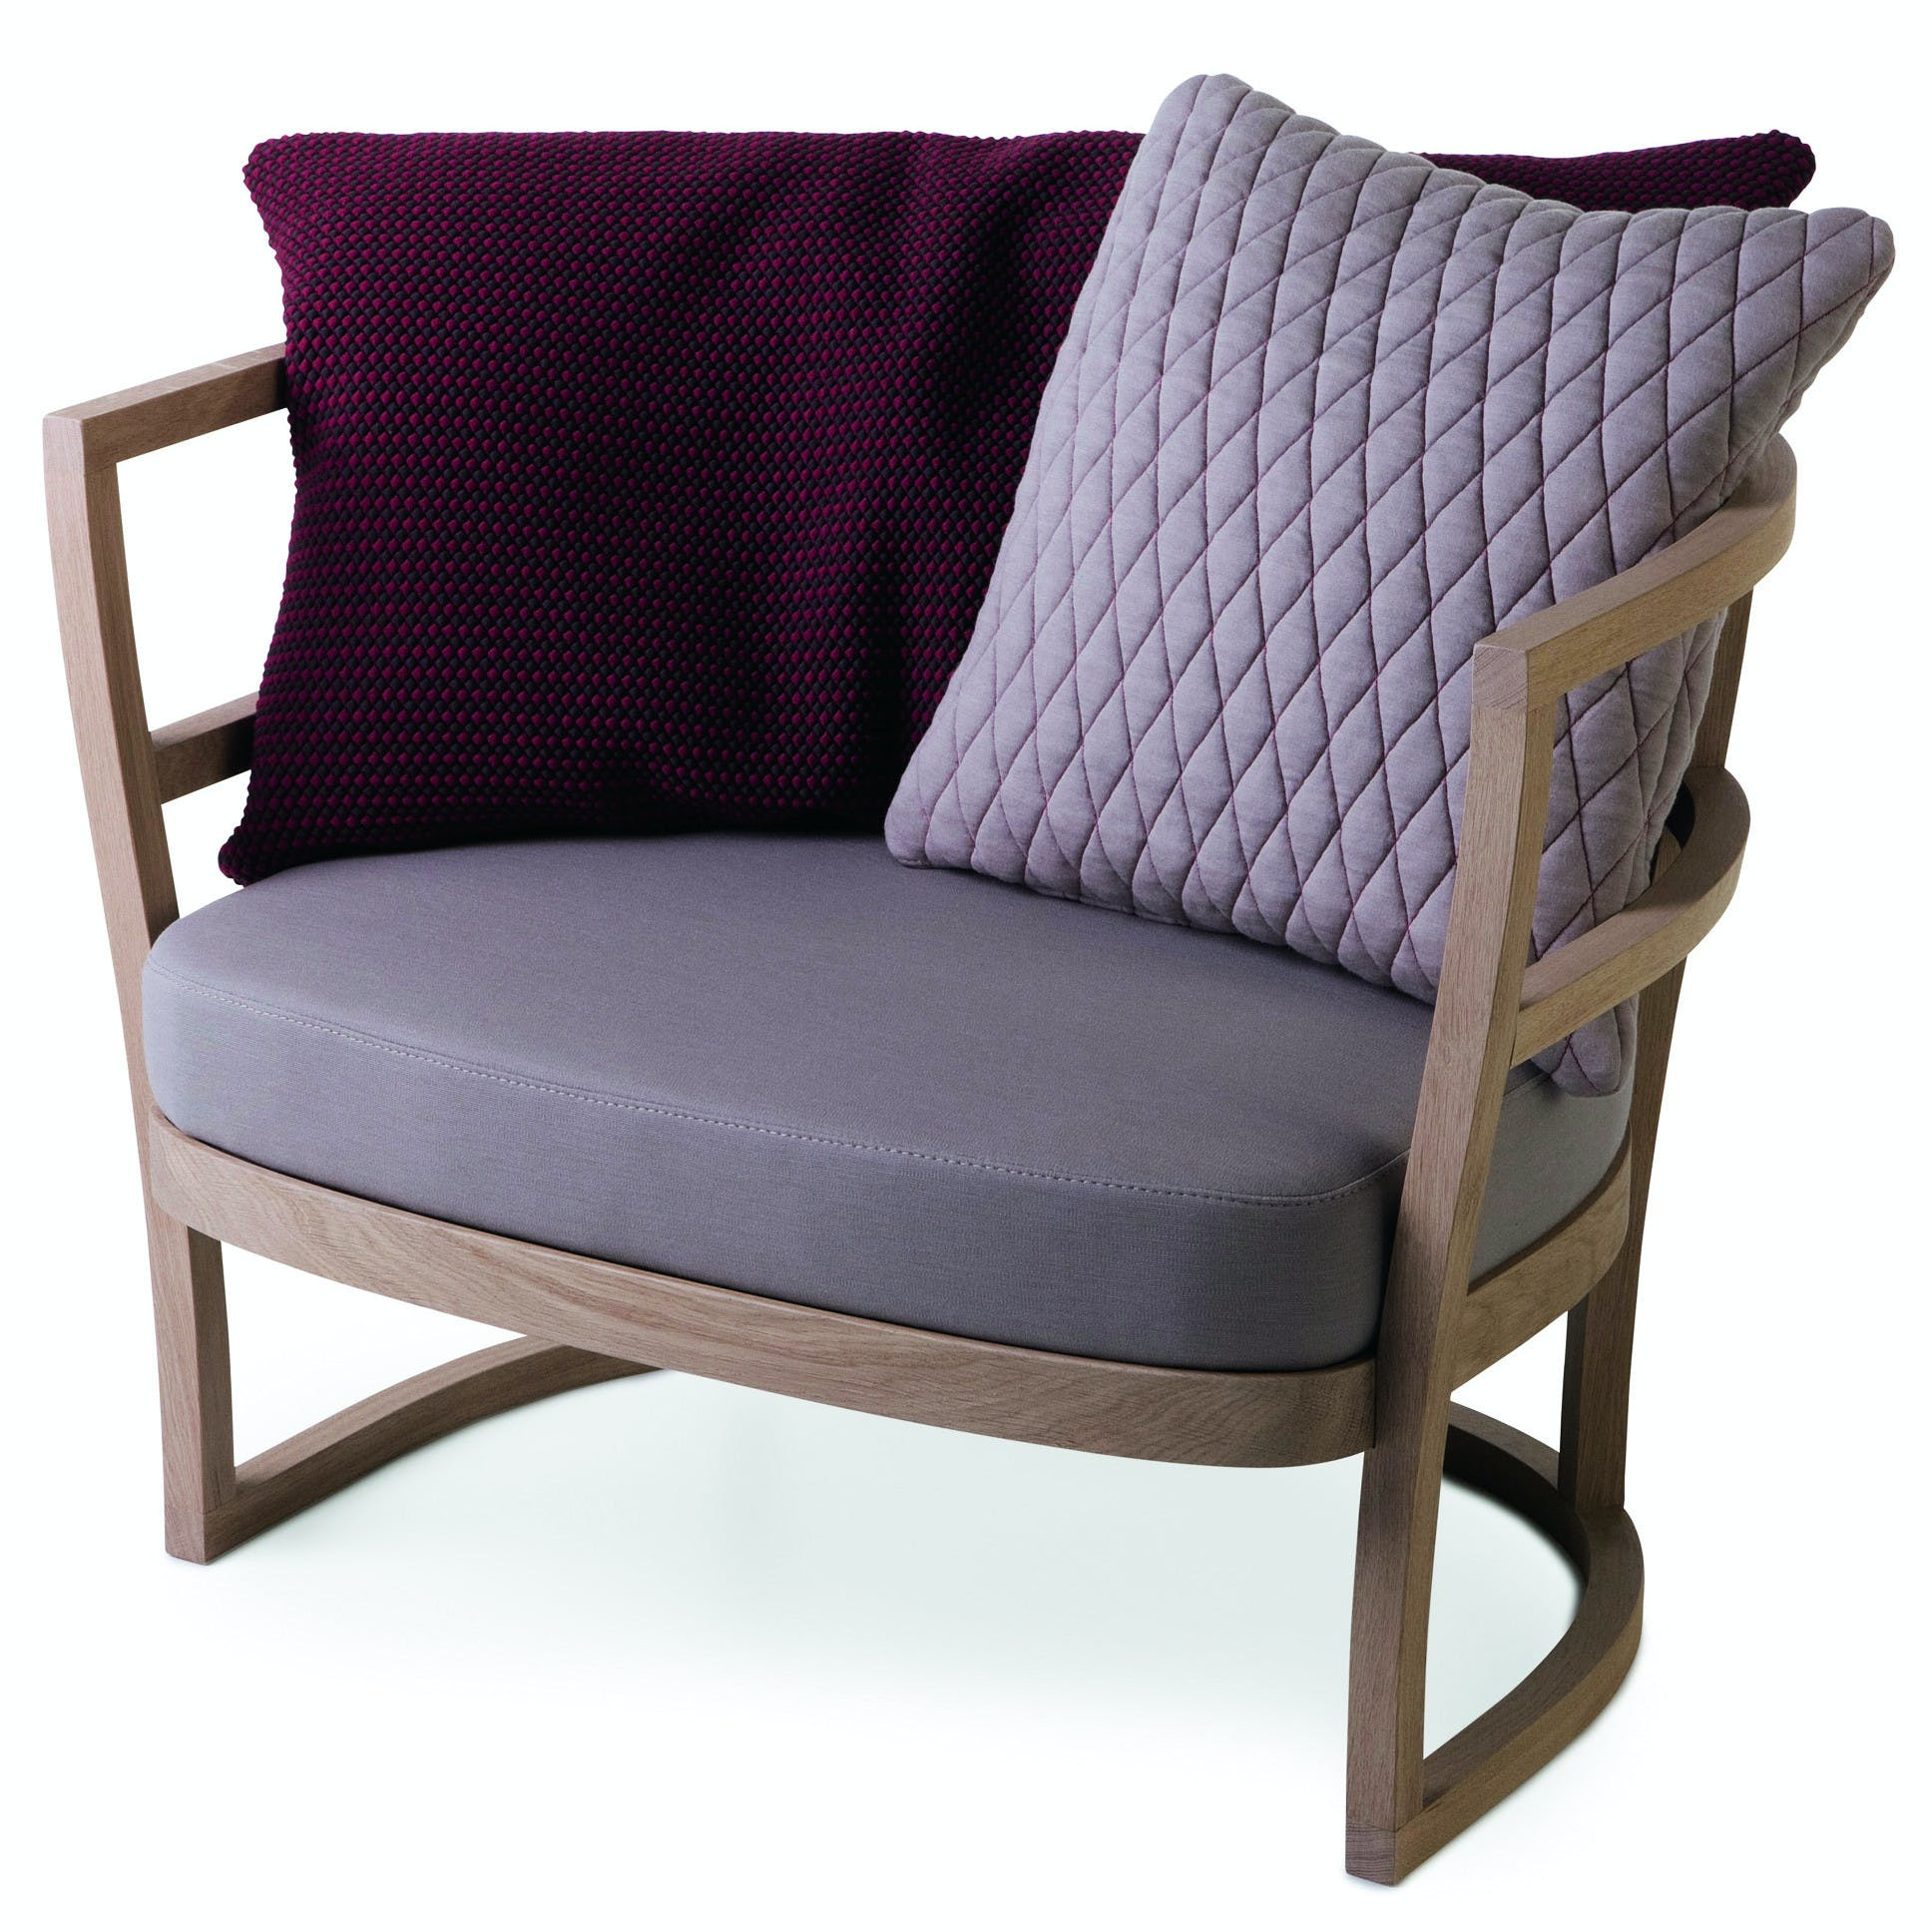 Dum-furniture-wood-wagner-haute-living